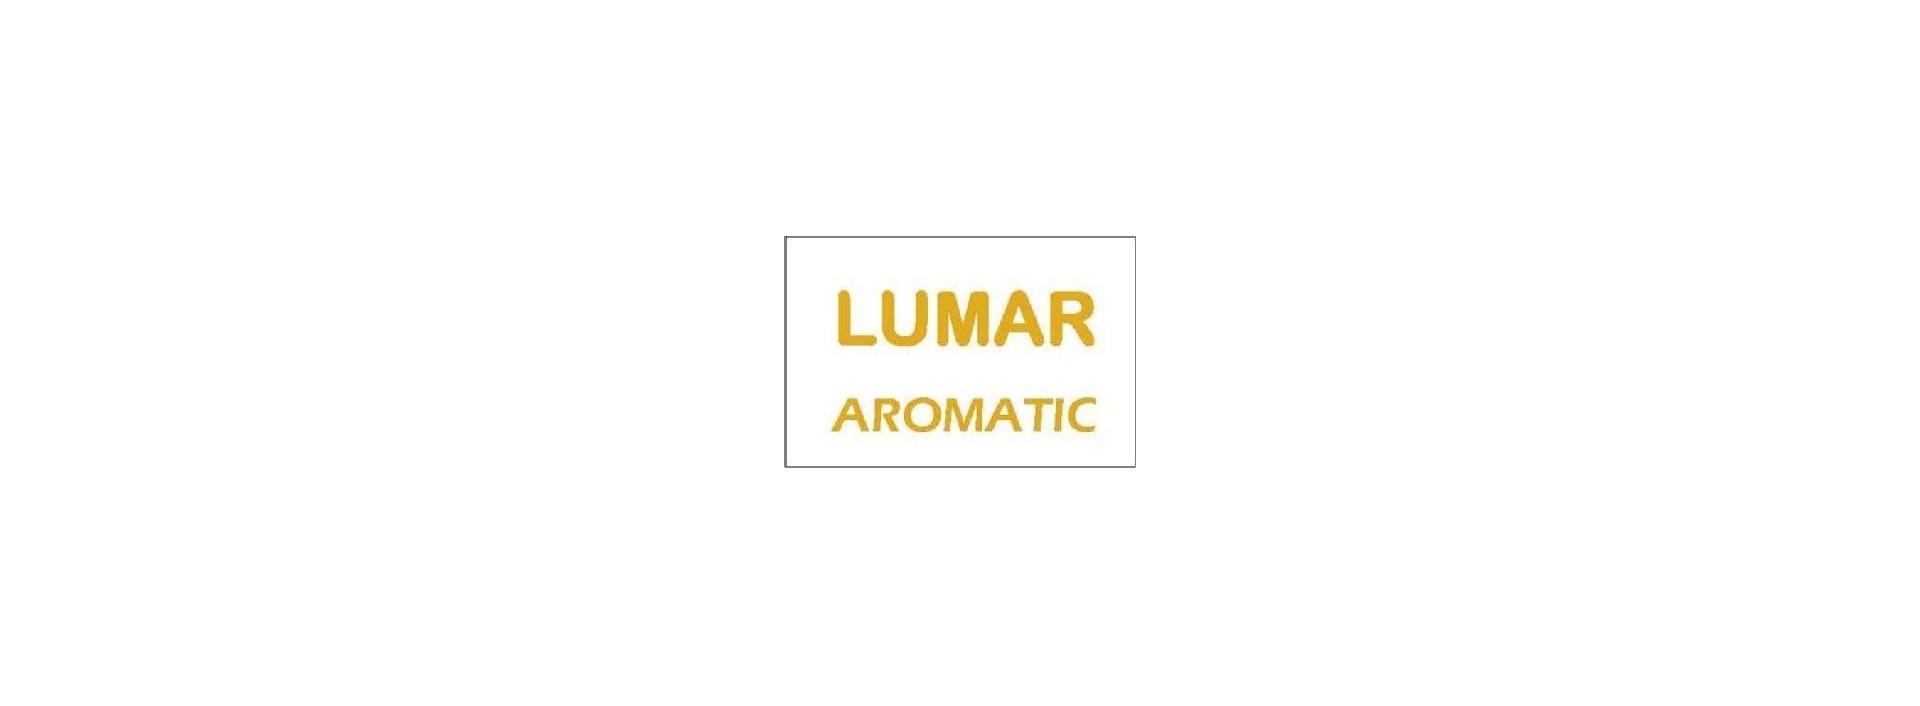 LUMAR AROMATIC